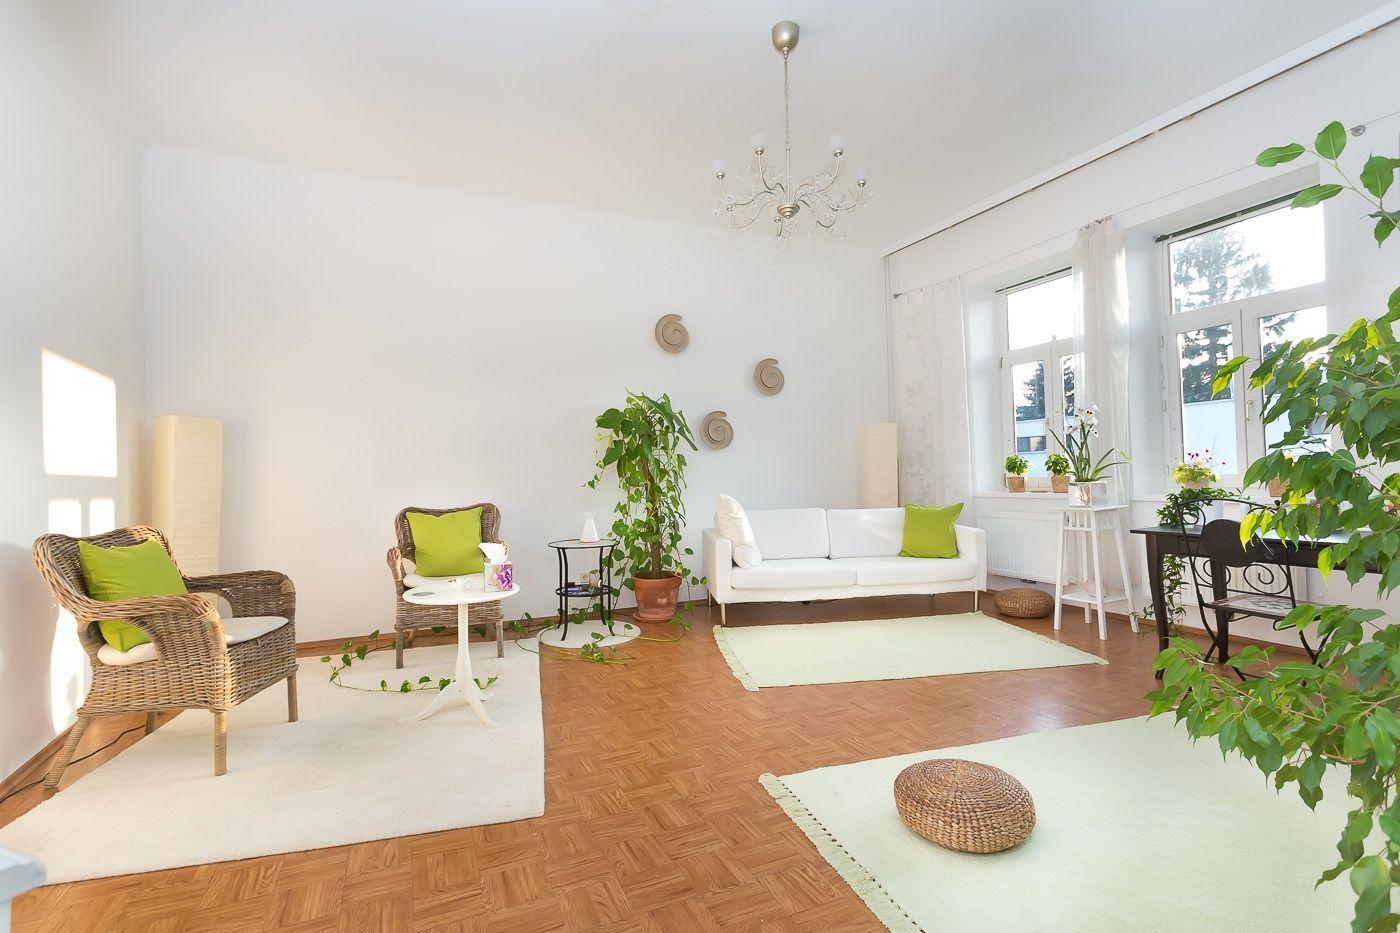 #PsychiatristHome in 2020 | Home decor, Home, Furniture